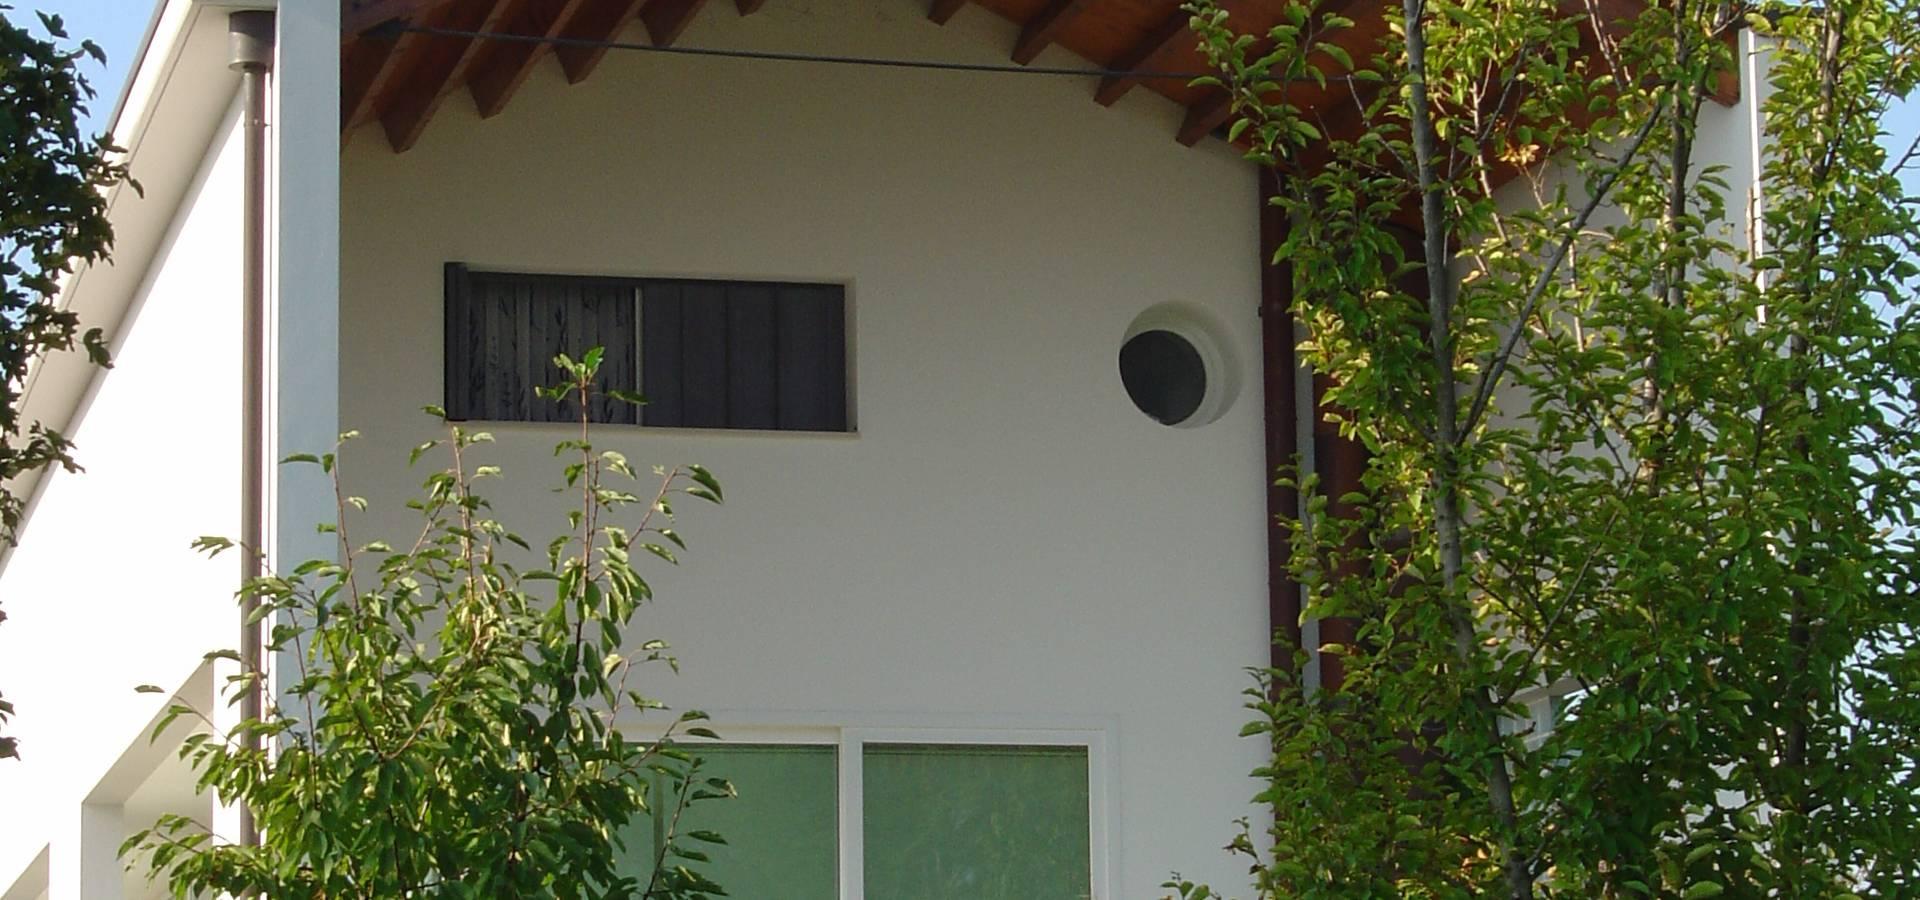 GINO FASAN ARCHITETTO